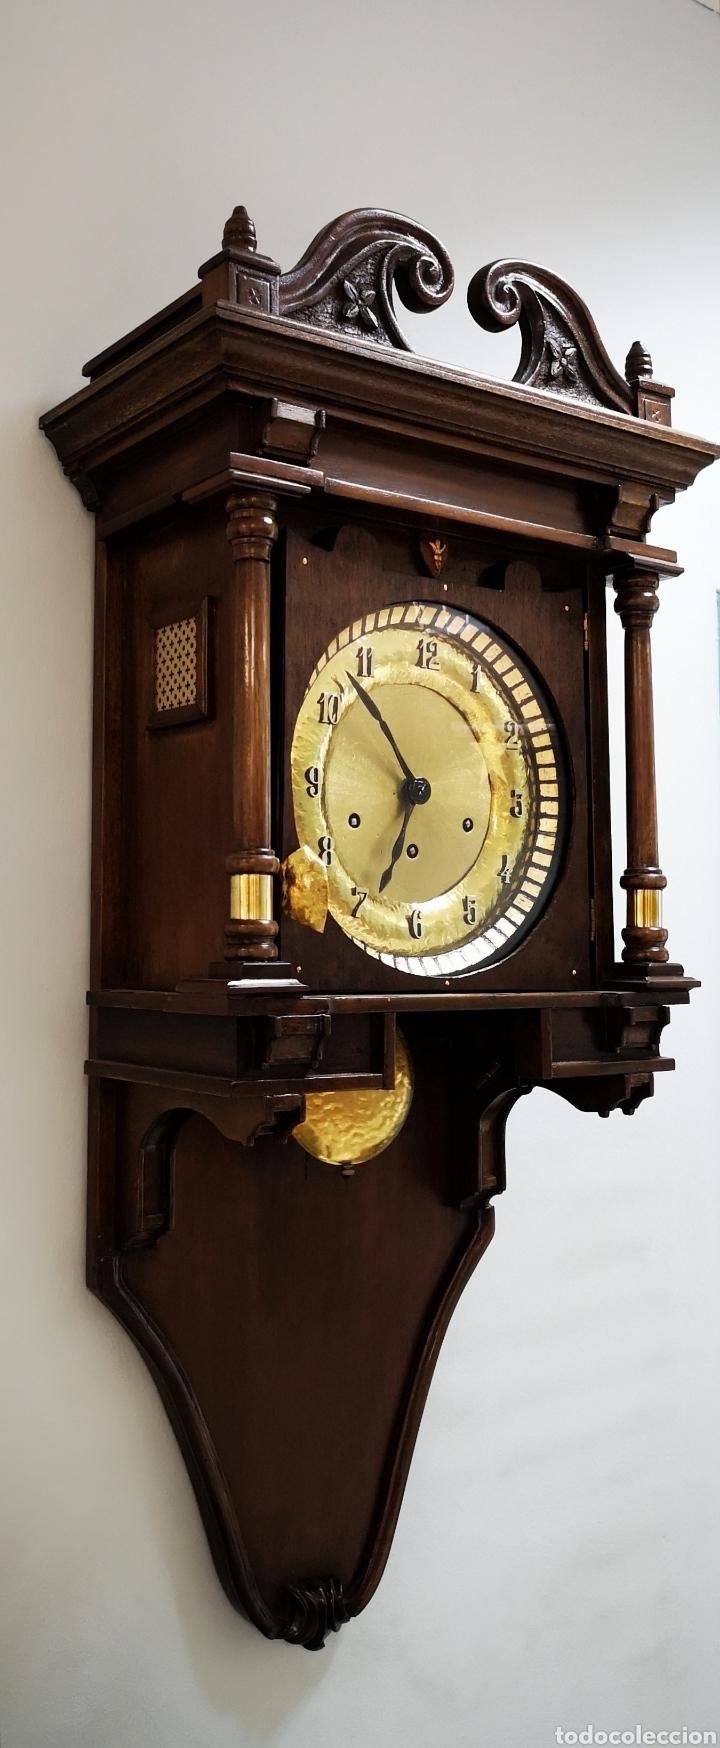 Relojes de pared: Reloj de pared, Carillon 8 dias cuerda - Foto 3 - 165462269